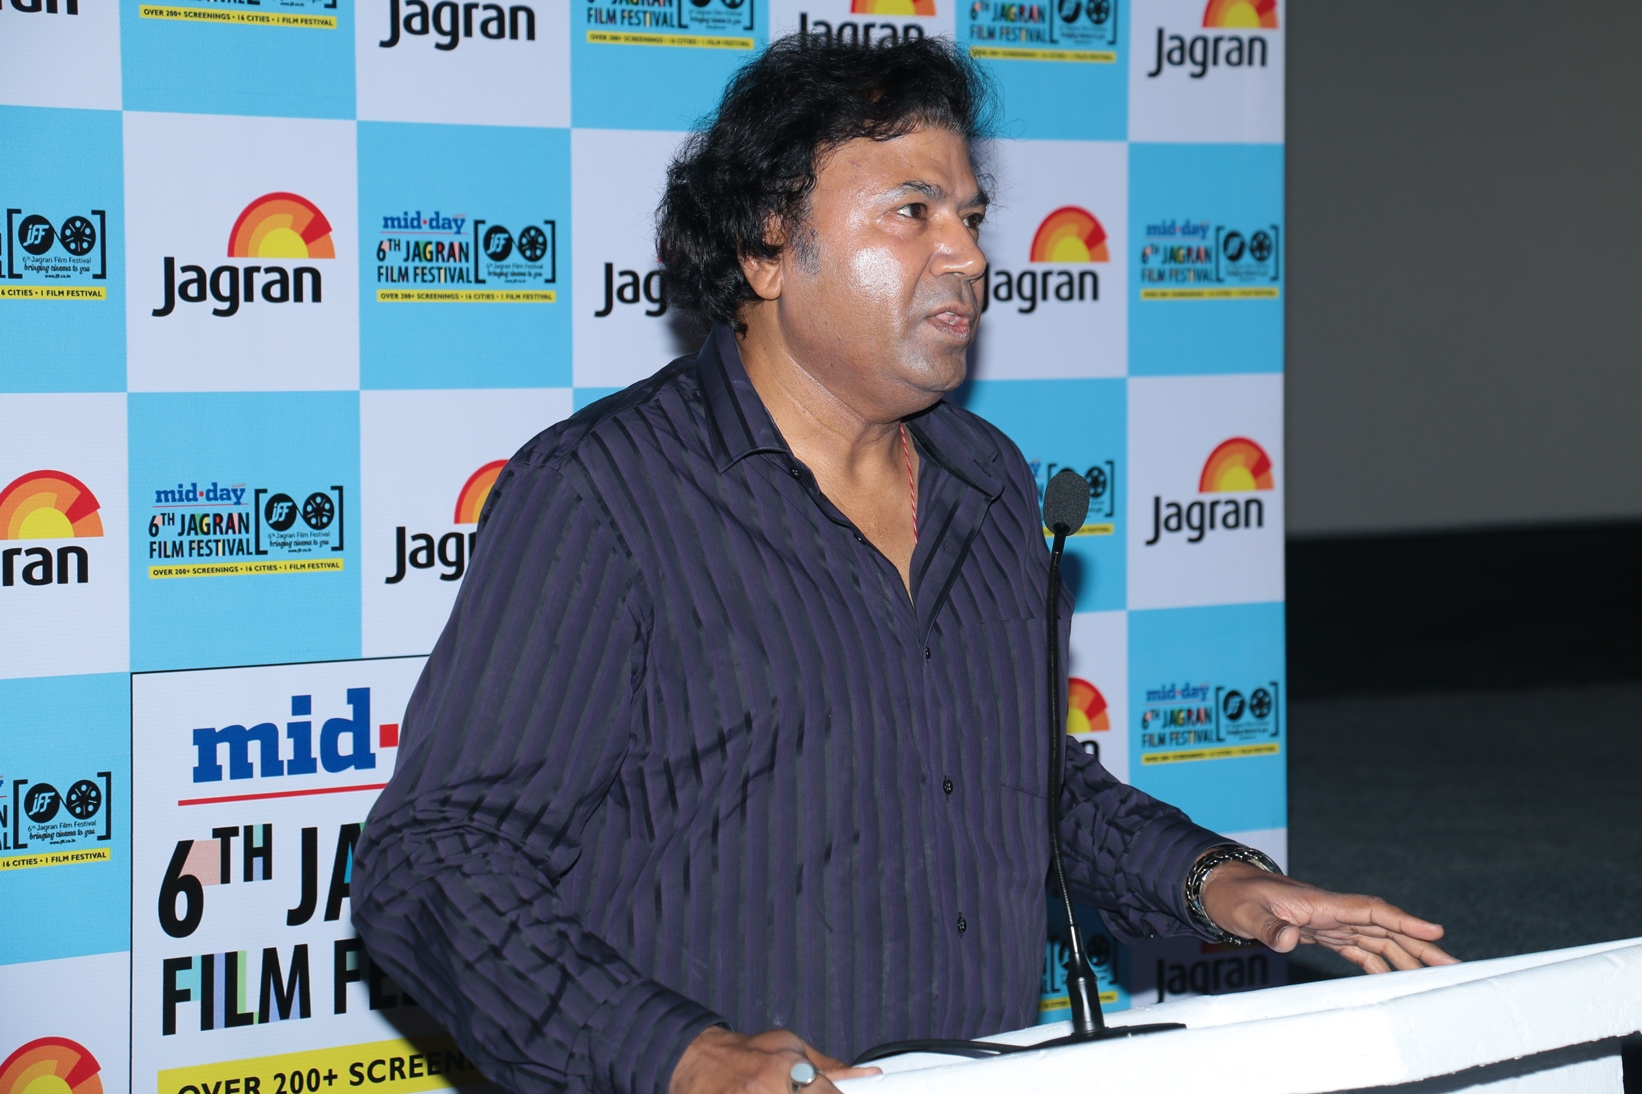 Mr. Manoj Srivastava (Strategic Consultant, Jagran Film Festival)